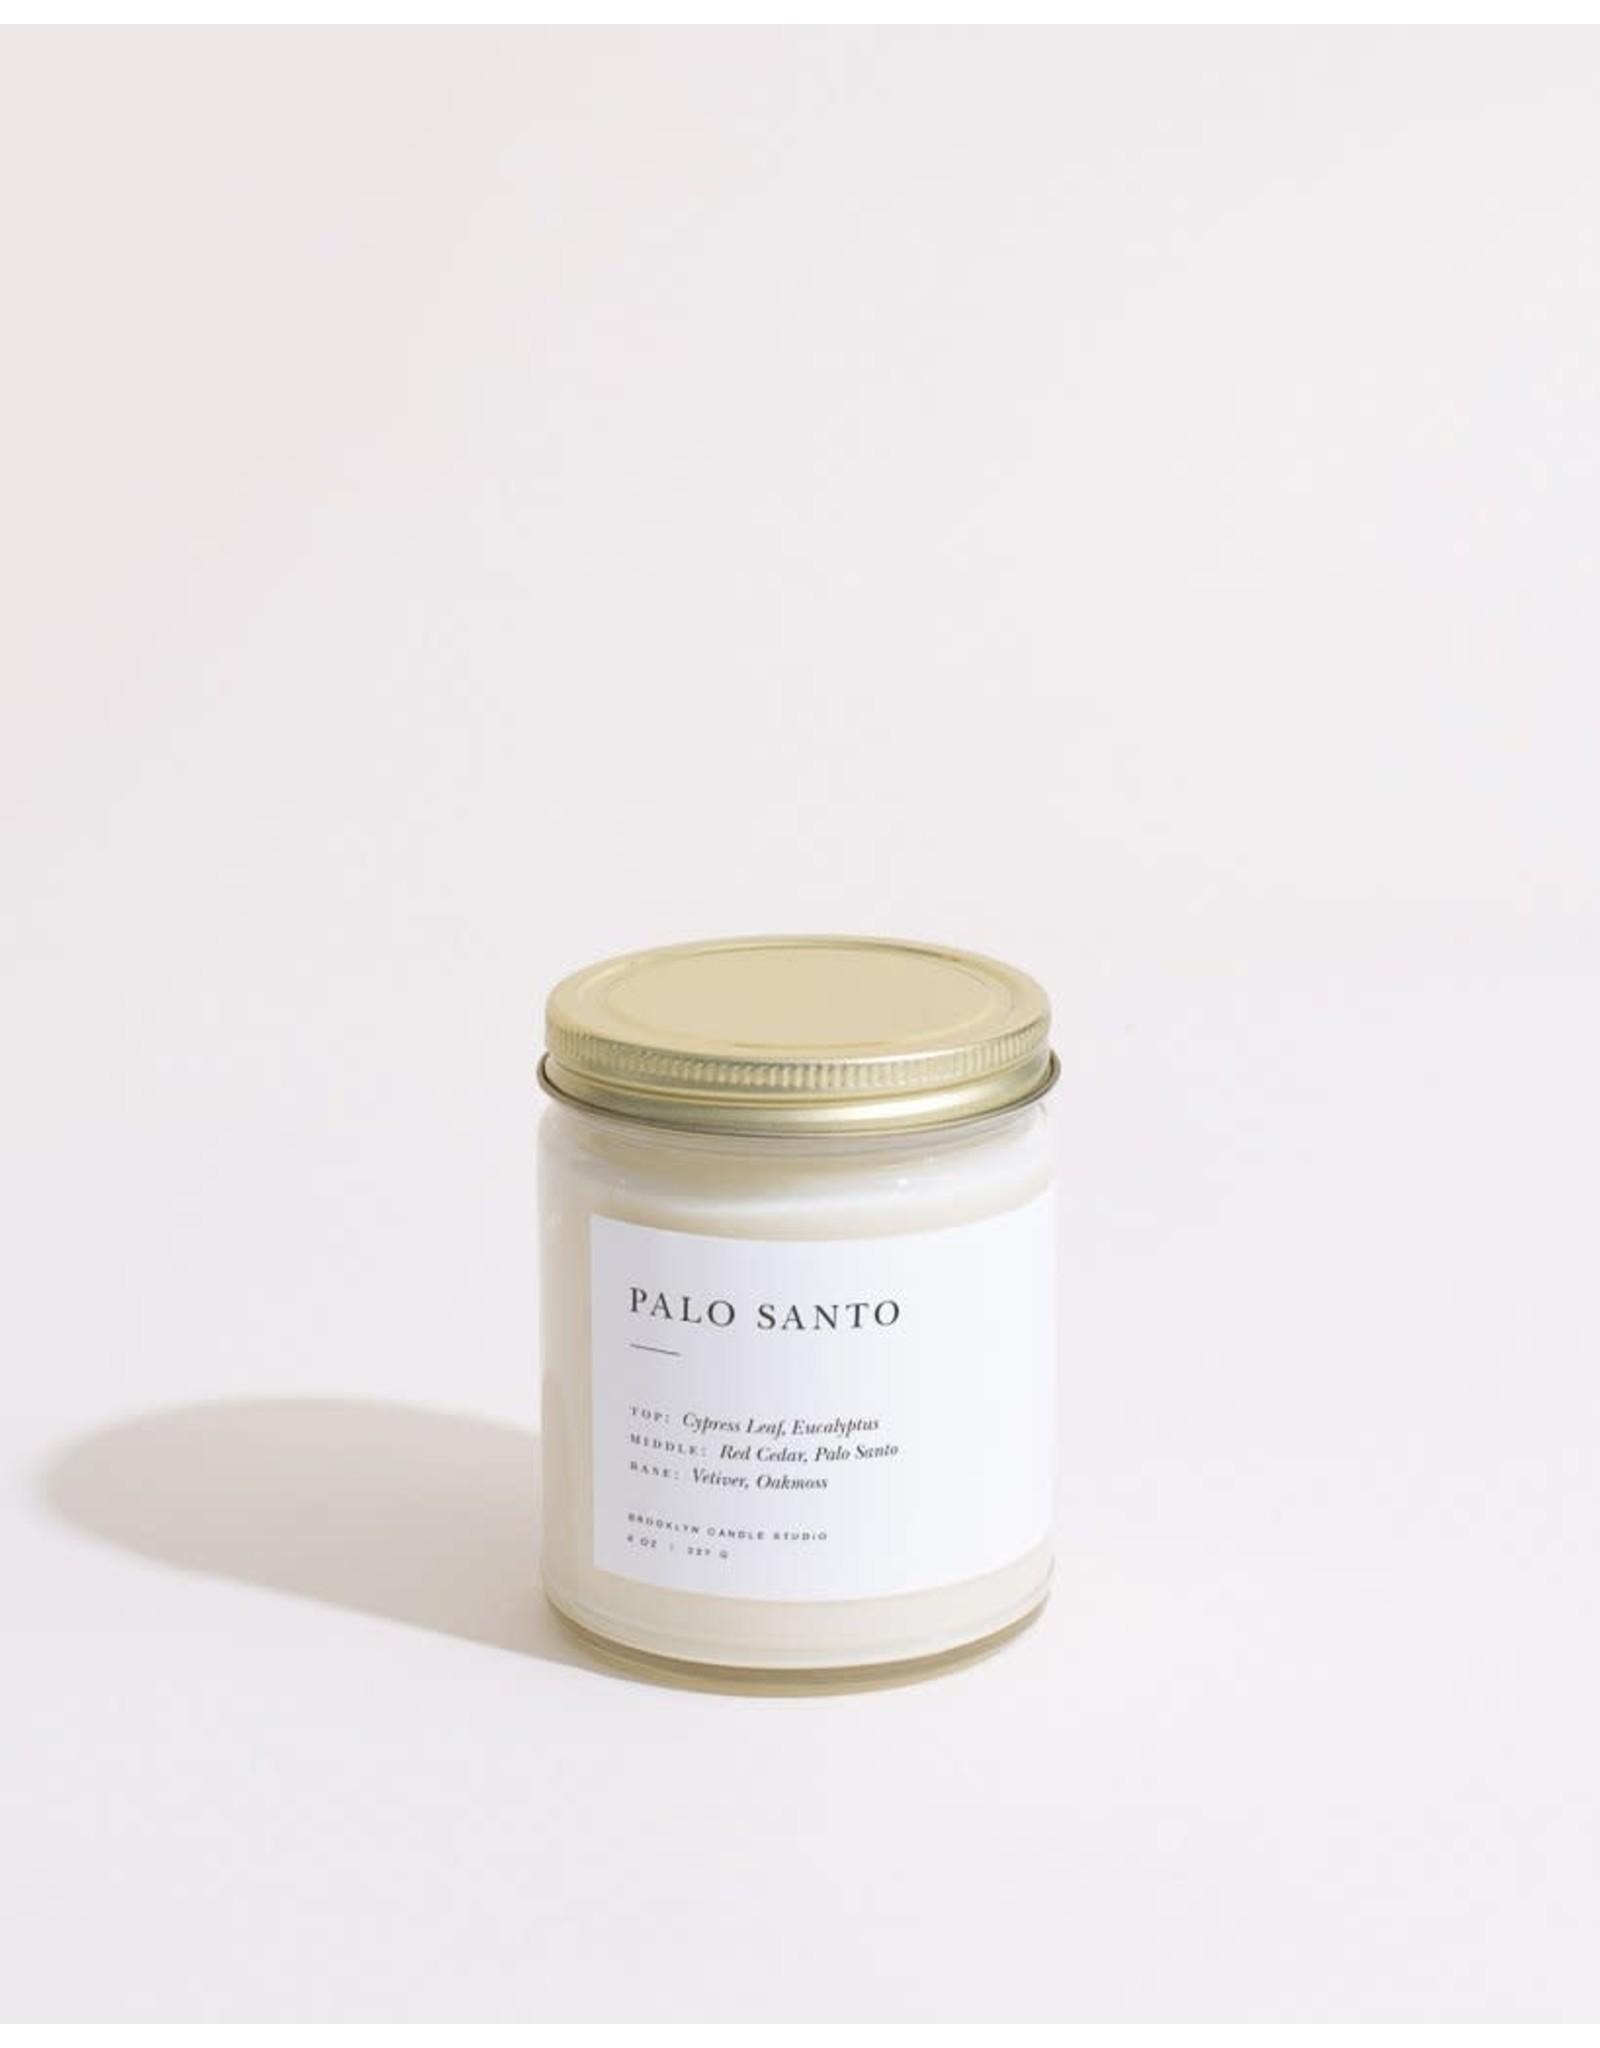 Brooklyn Candle Studio Palo Santo - Minimalist Jar Candle - Brooklyn Candle Studio